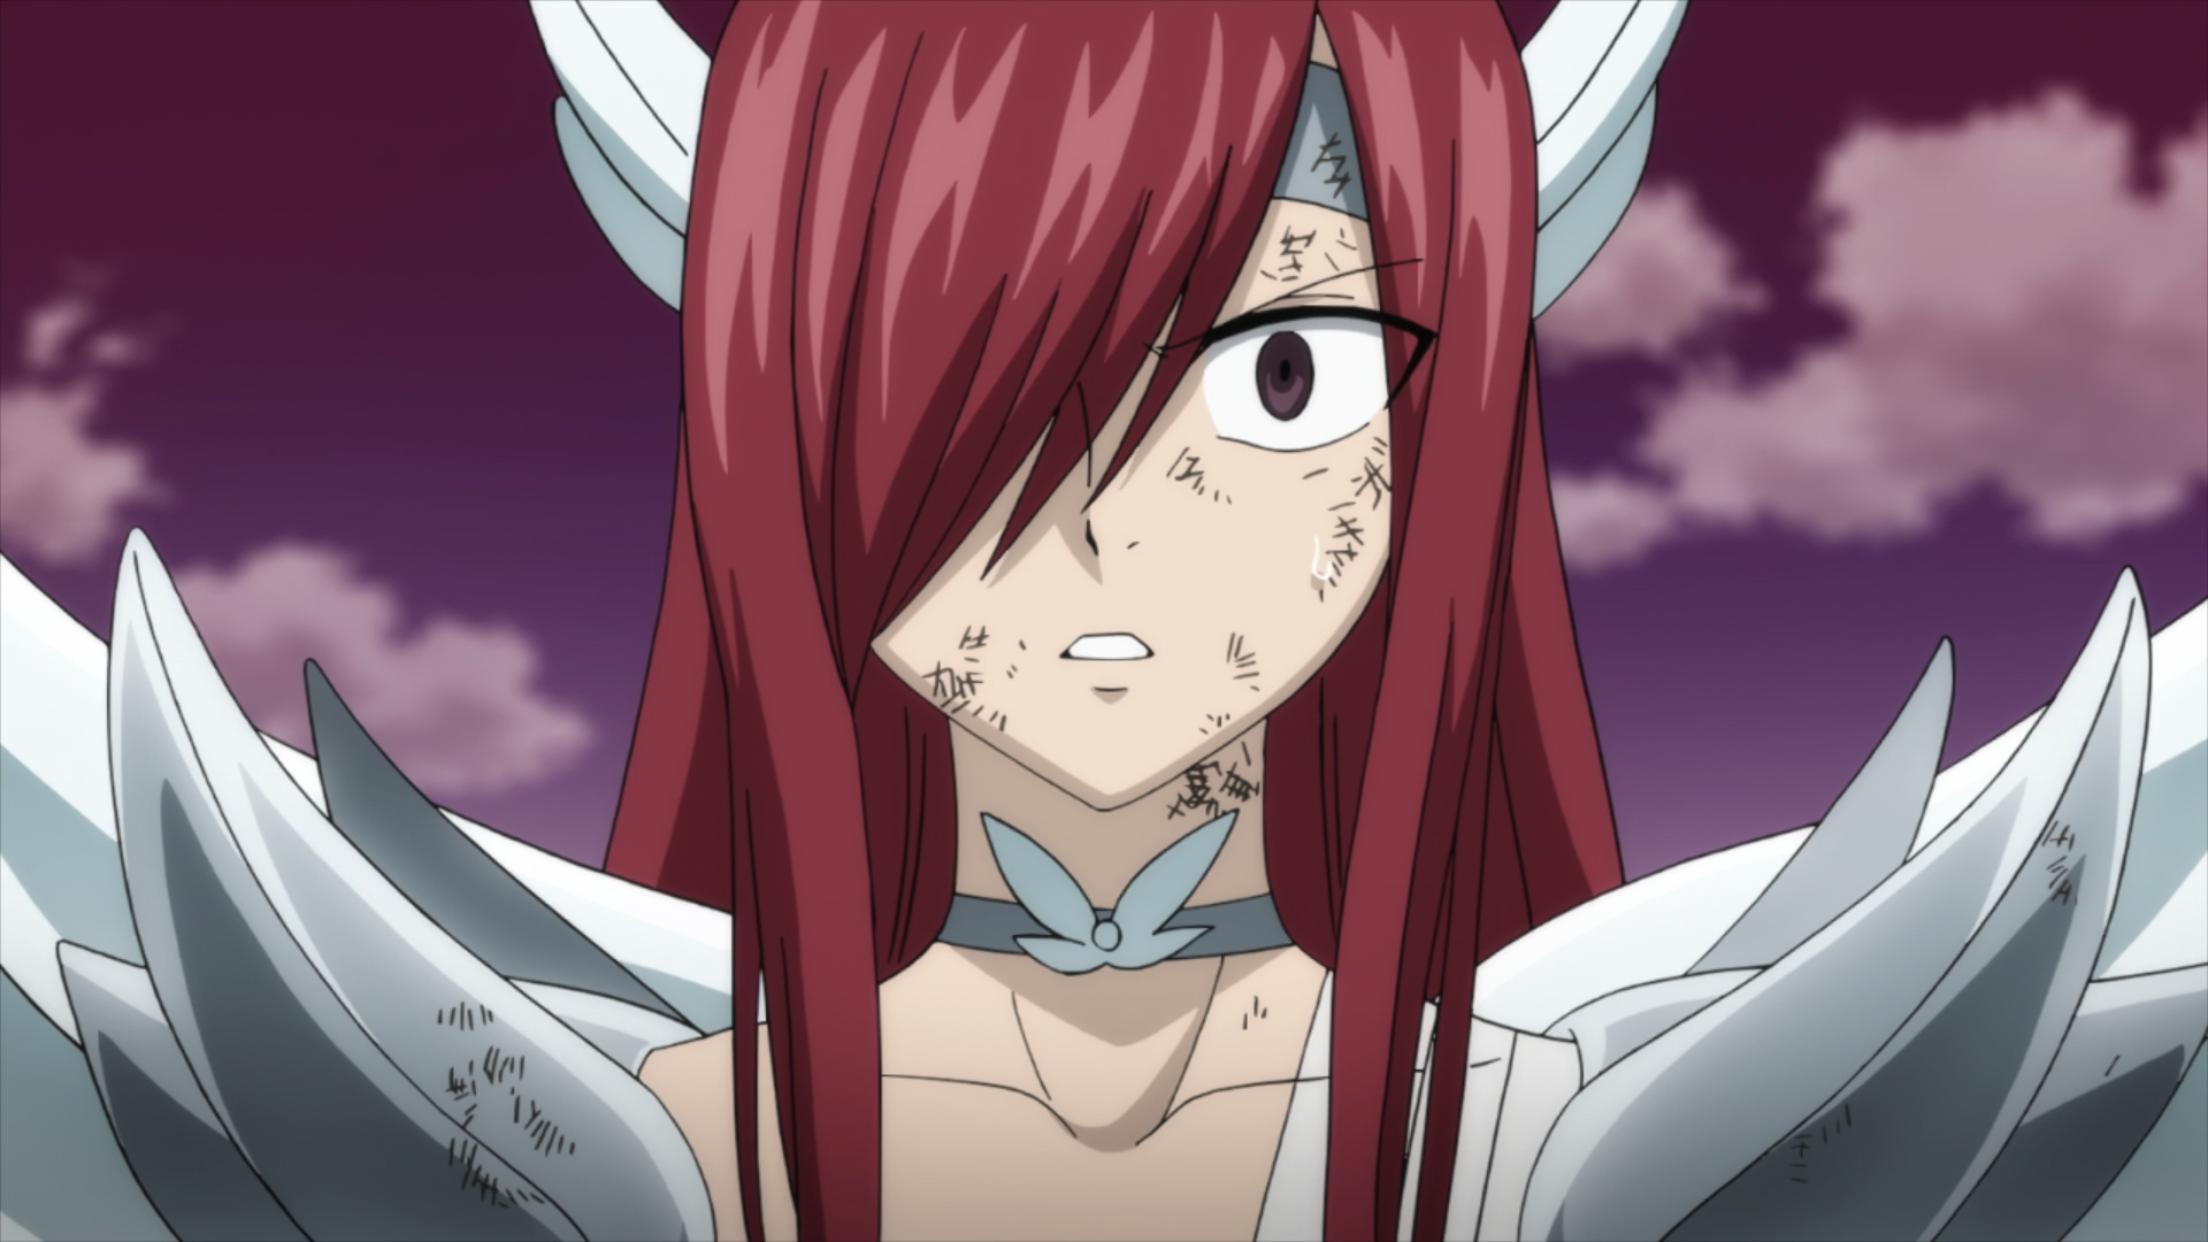 Fairy Tail 2018 Episode 50 Fairy tail erza scarlet, Erza